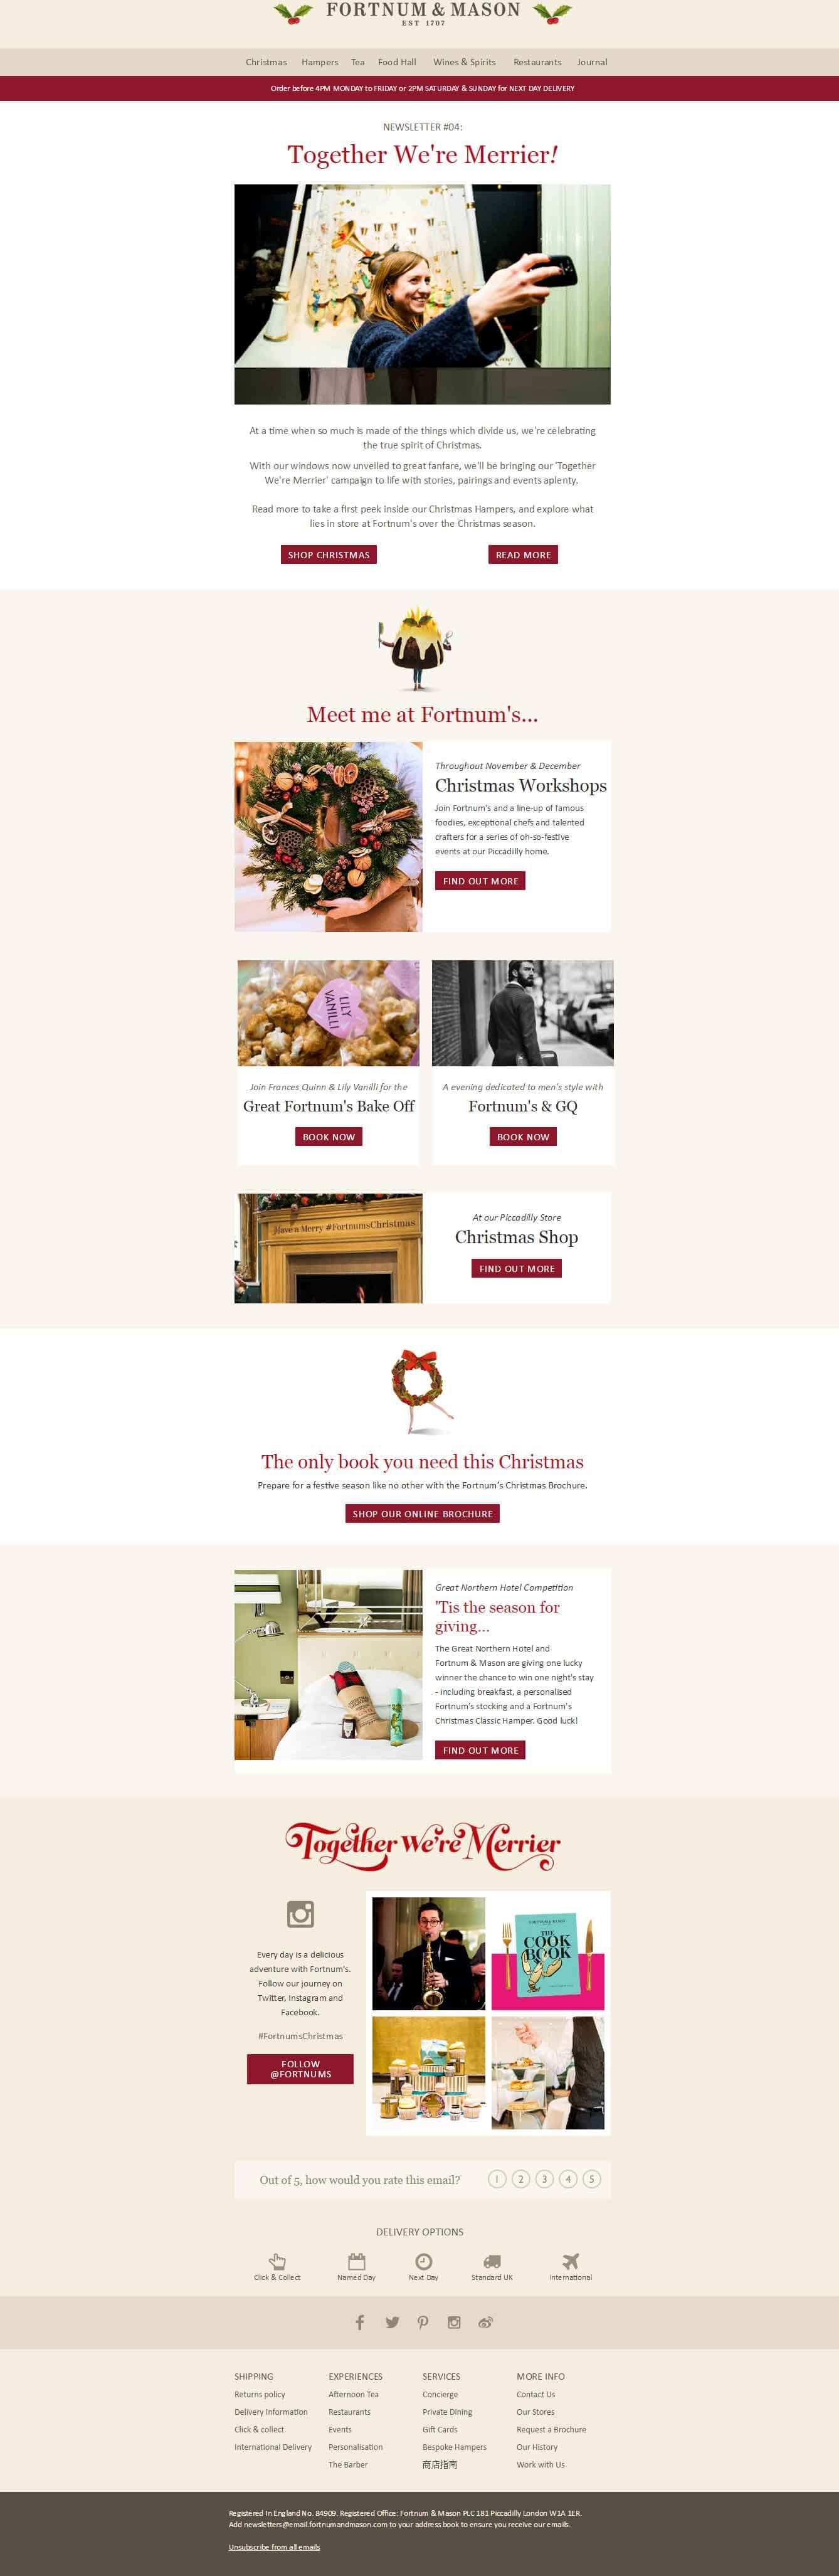 Fortnum & Mason Christmas email example